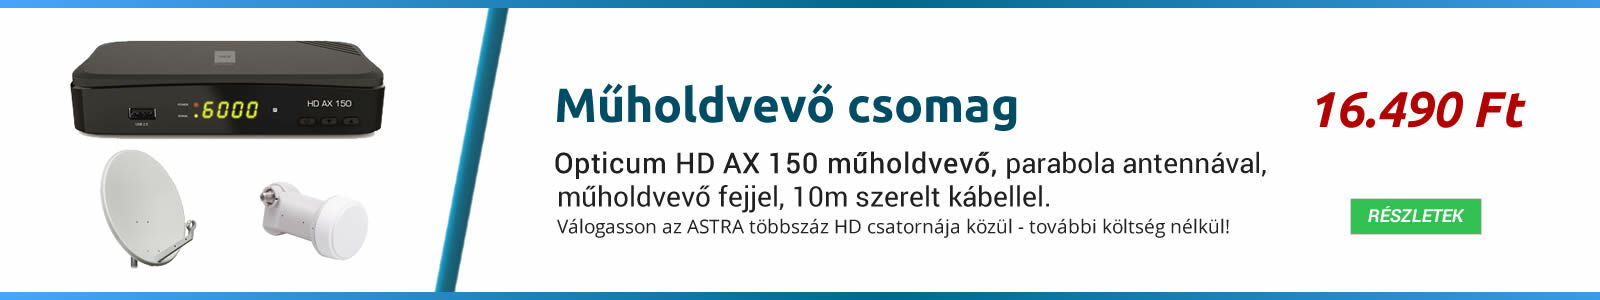 Műholdvevő csomag - akciós ASTRA vétel